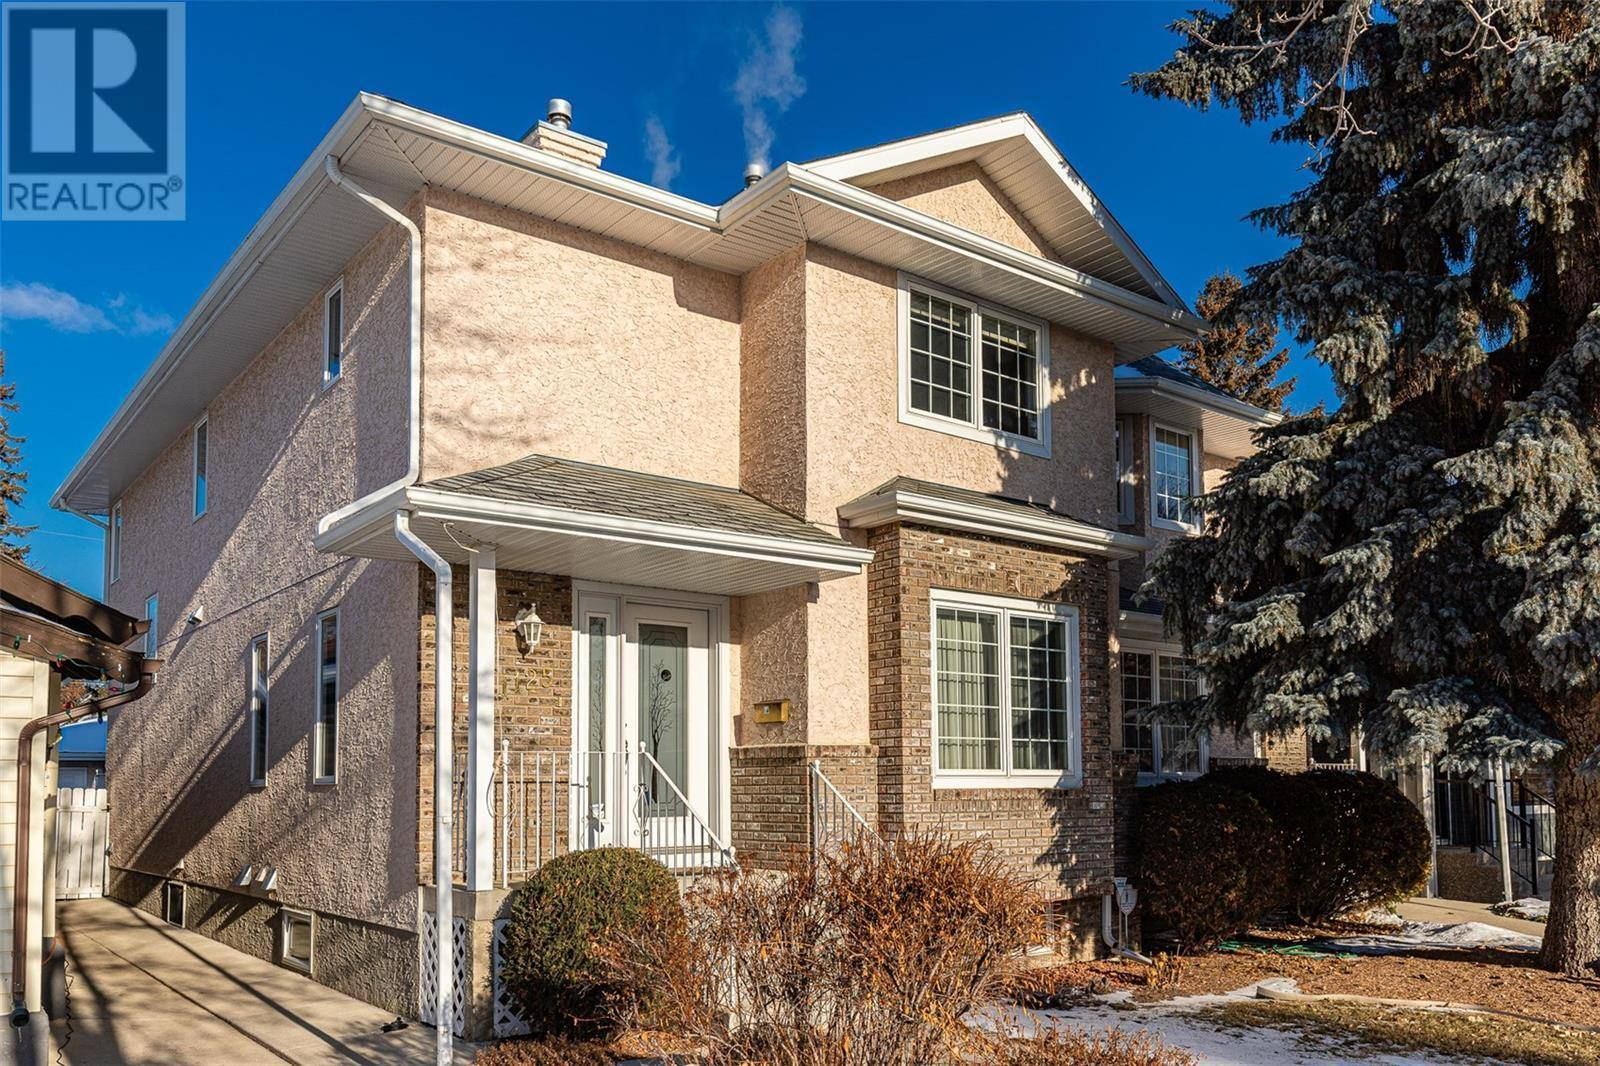 House for sale at 1125 11th St E Saskatoon Saskatchewan - MLS: SK791391